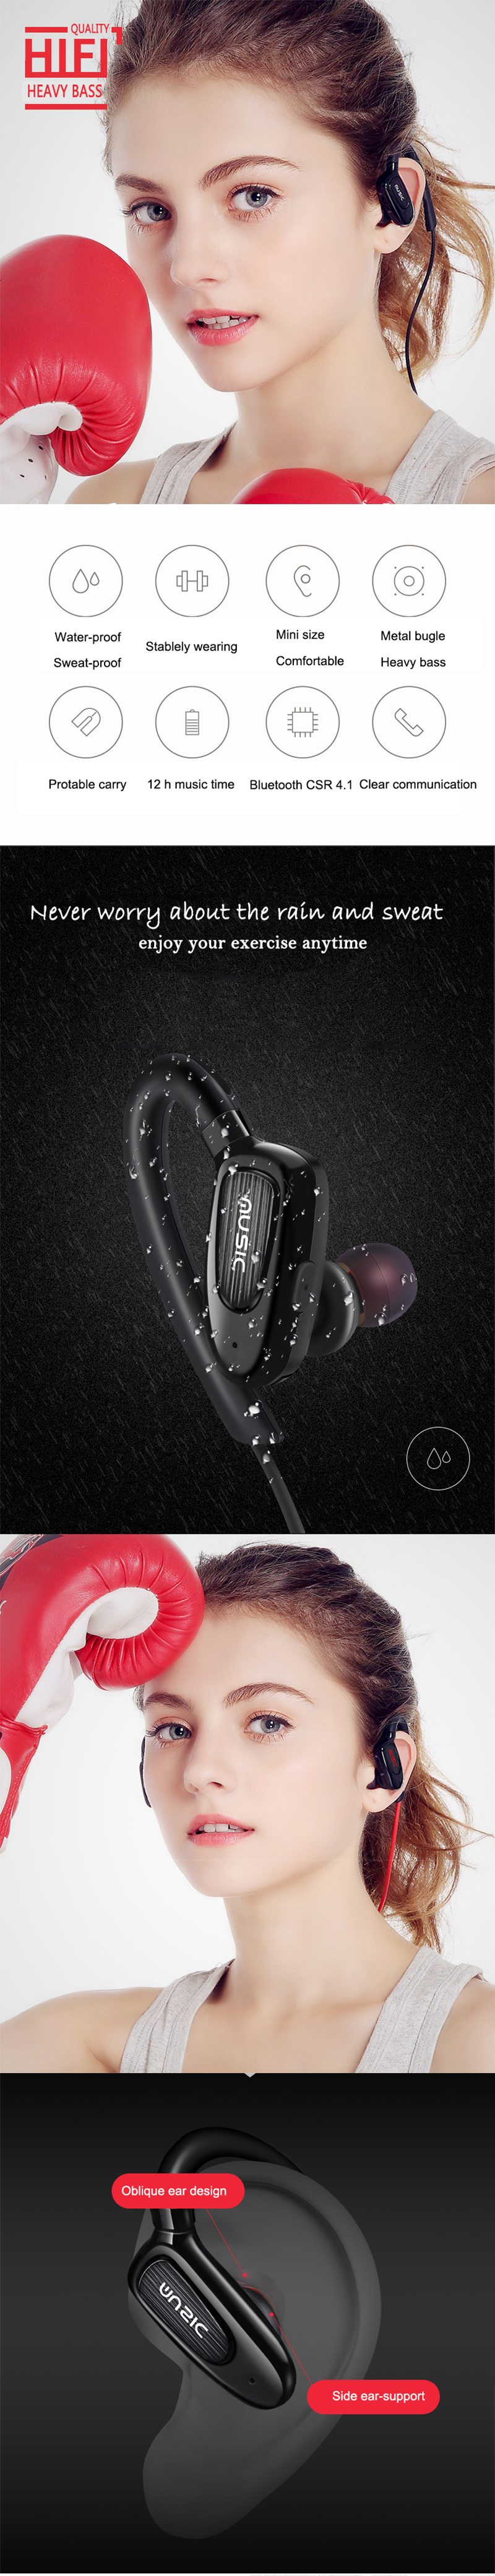 Ubit S5 HIFI Bluetooth Earphone CSR4.1 Sports Ear-hook Headset Sweatproof Wireless Headphone With Mic Hands-free Calls Earbuds